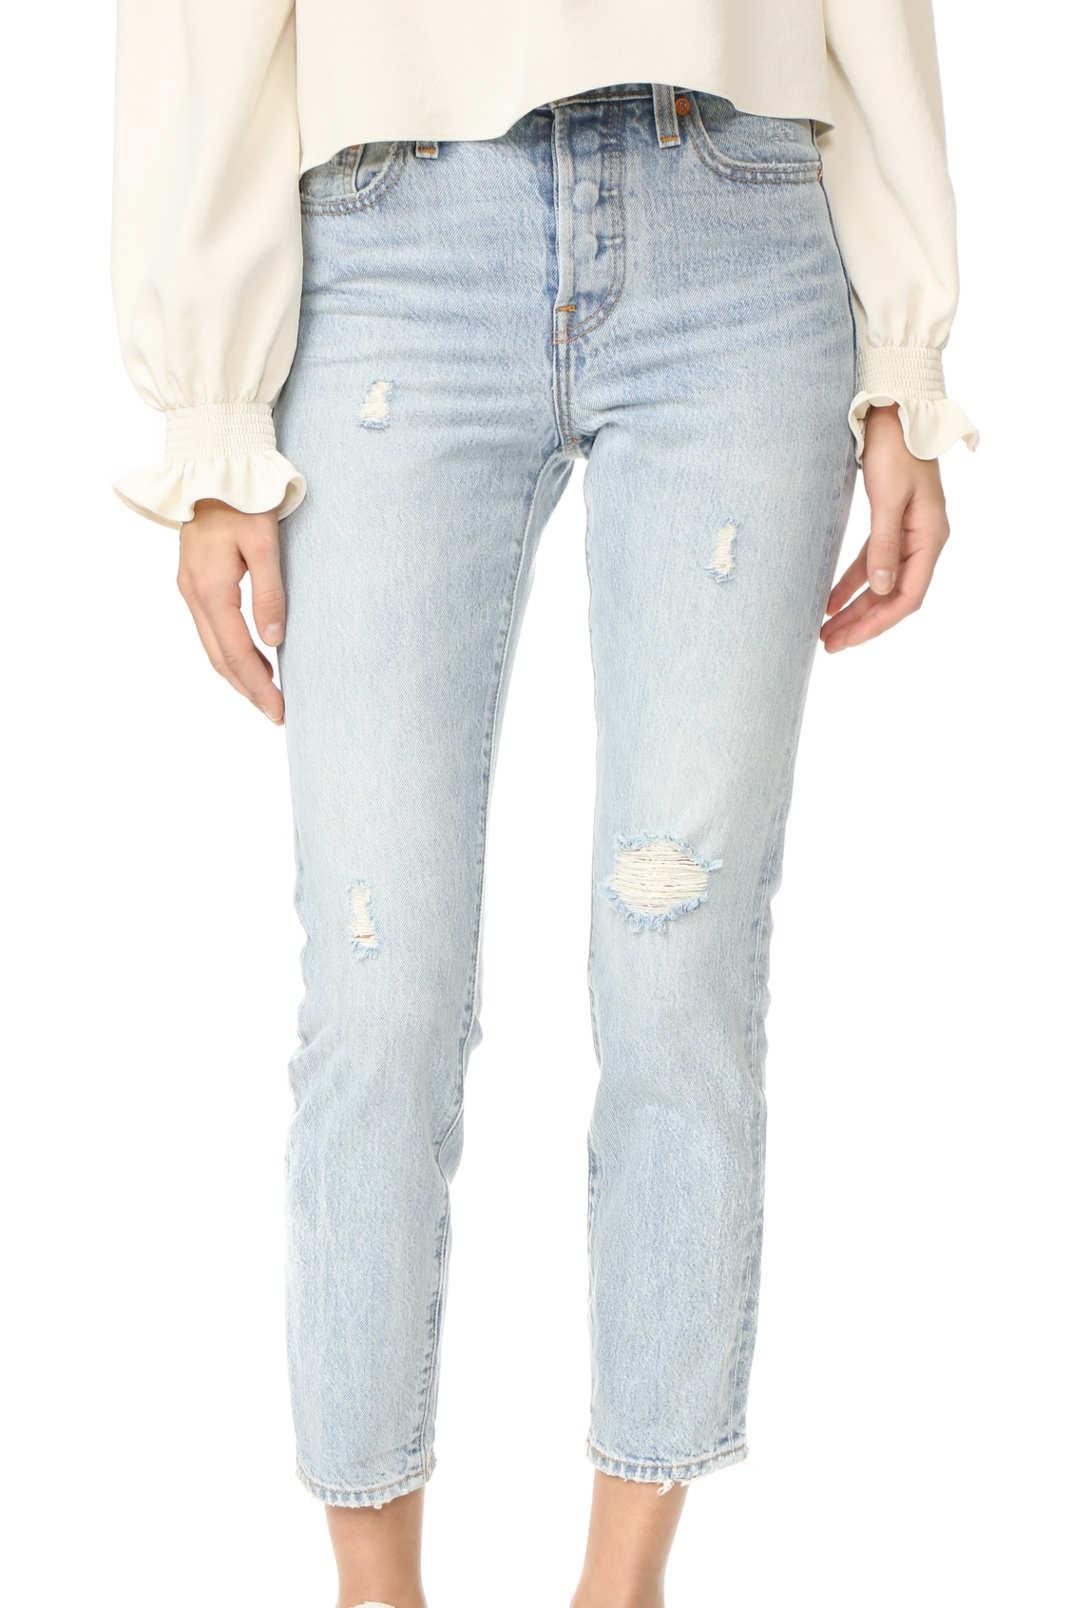 Levi's Wedgie Icon Selvedge Jeans